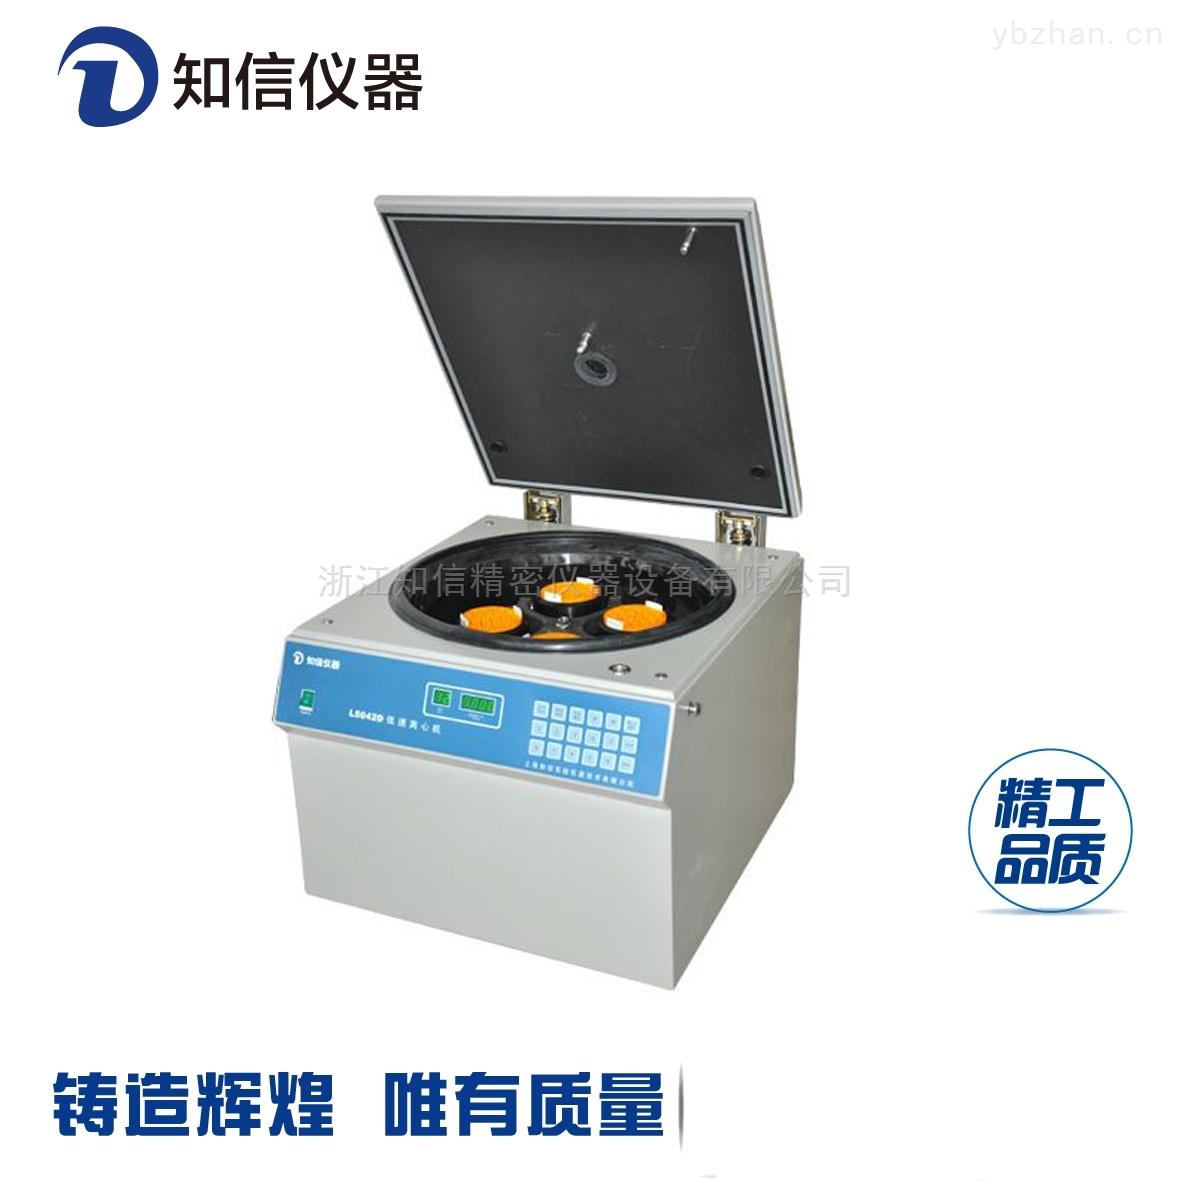 L5042D-上海知信仪器 台式低速离心机